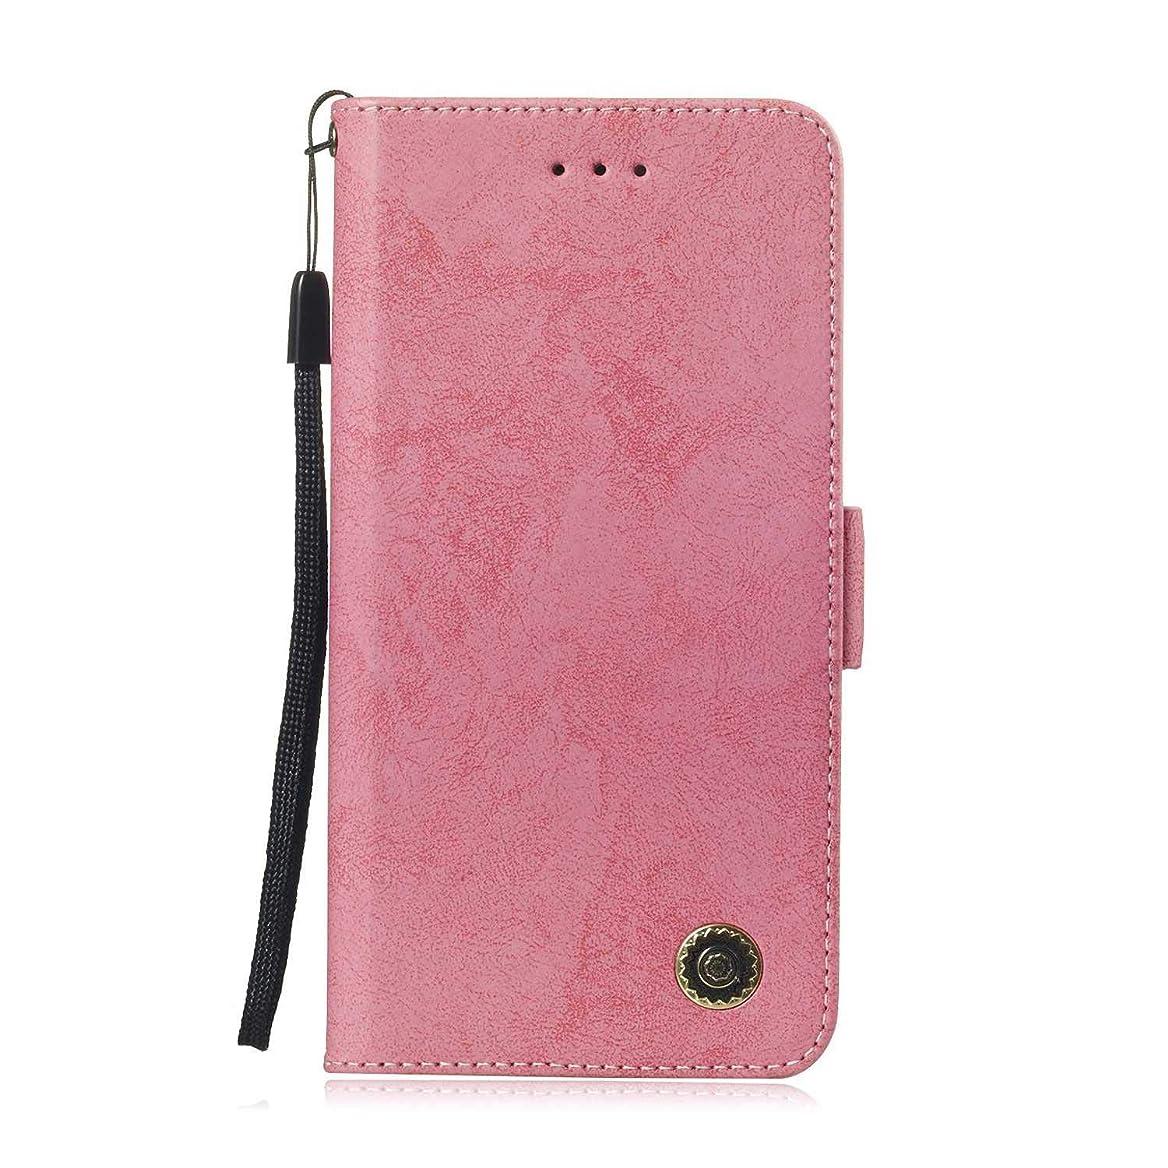 Zeebox? Huawei Honor 8C 手帳型ケース Huawei Honor 8C 手帳型カバー 財布型 合皮PUレザー マグネット式 保護ケース カード収納 スタンド 機能 (ピンク #3)